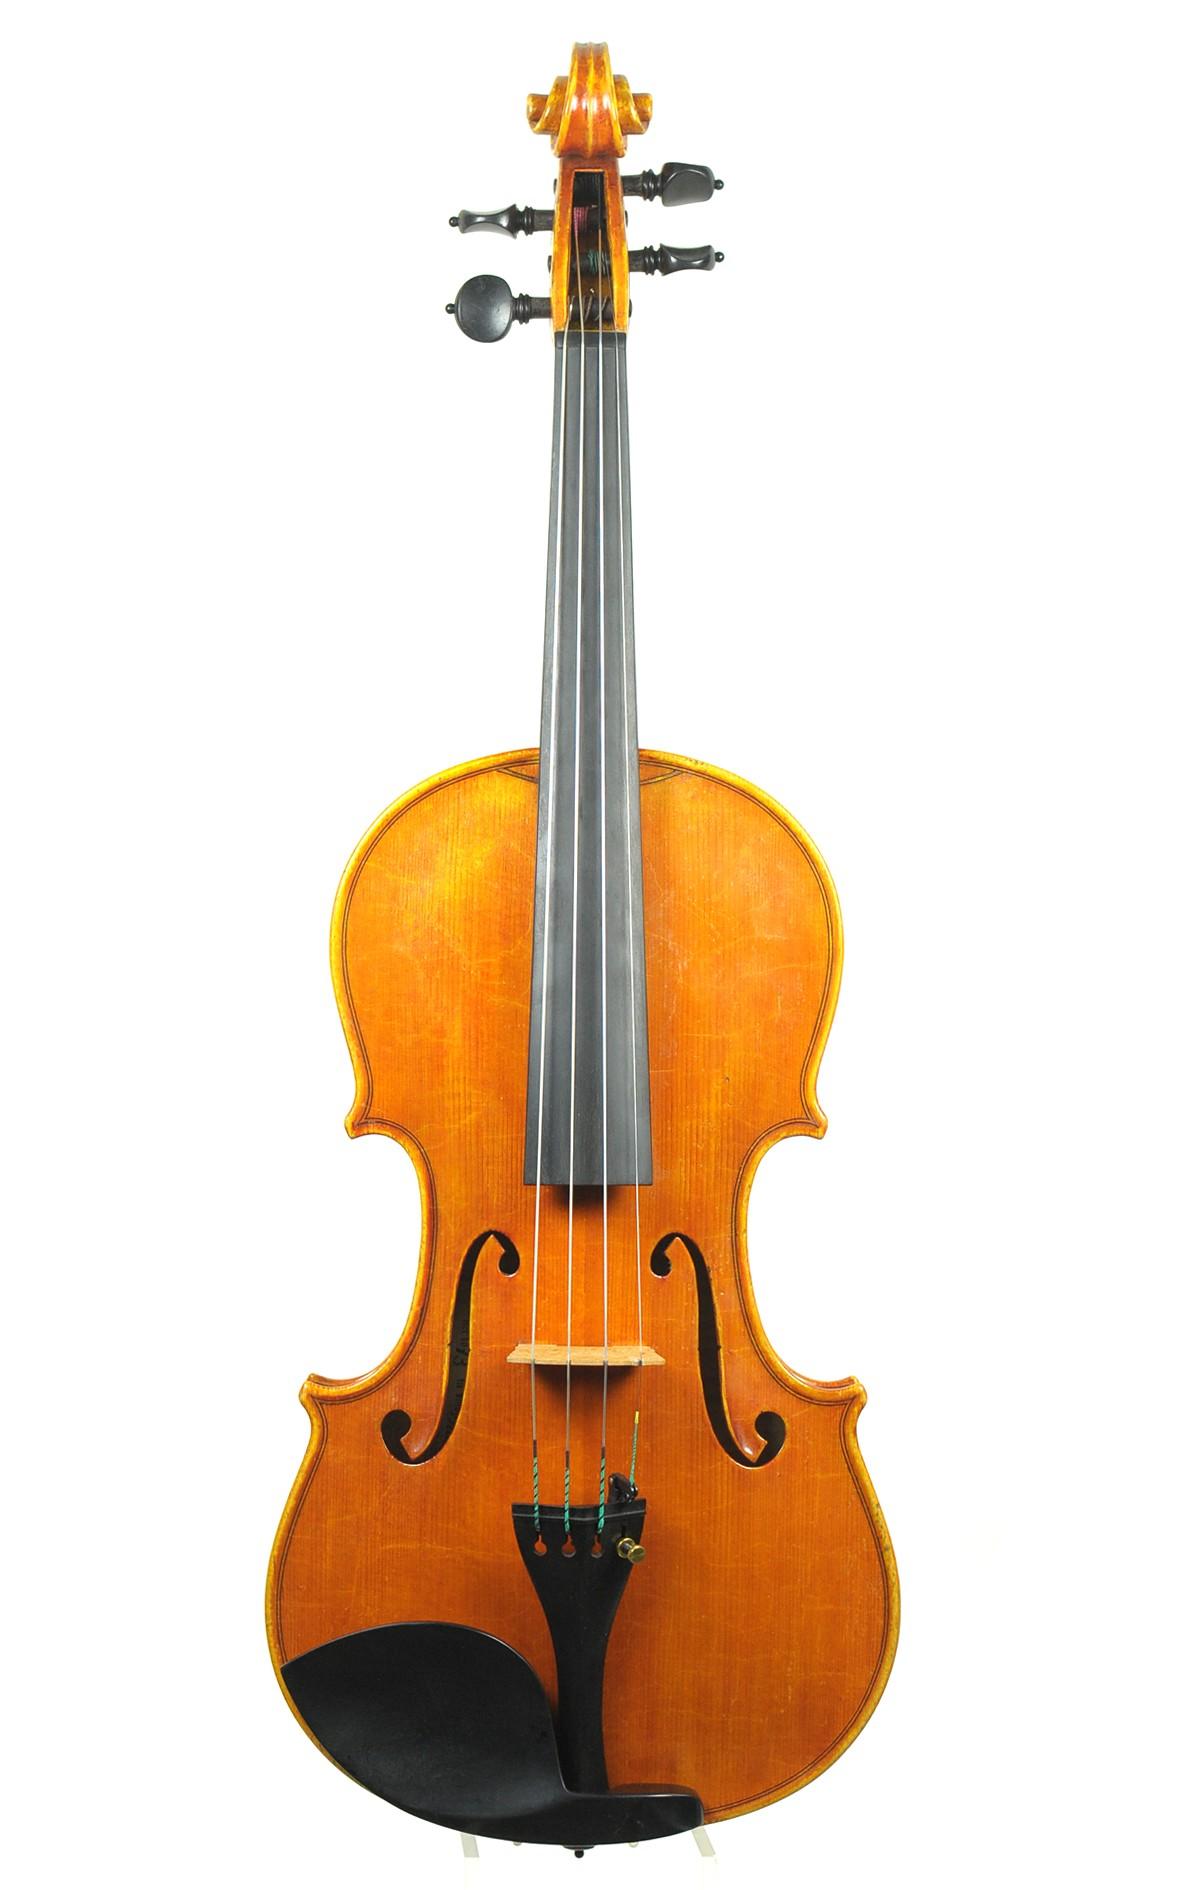 Italian violin by Primo Contavalli, 1973 (certificate by Benjamin Schröder)